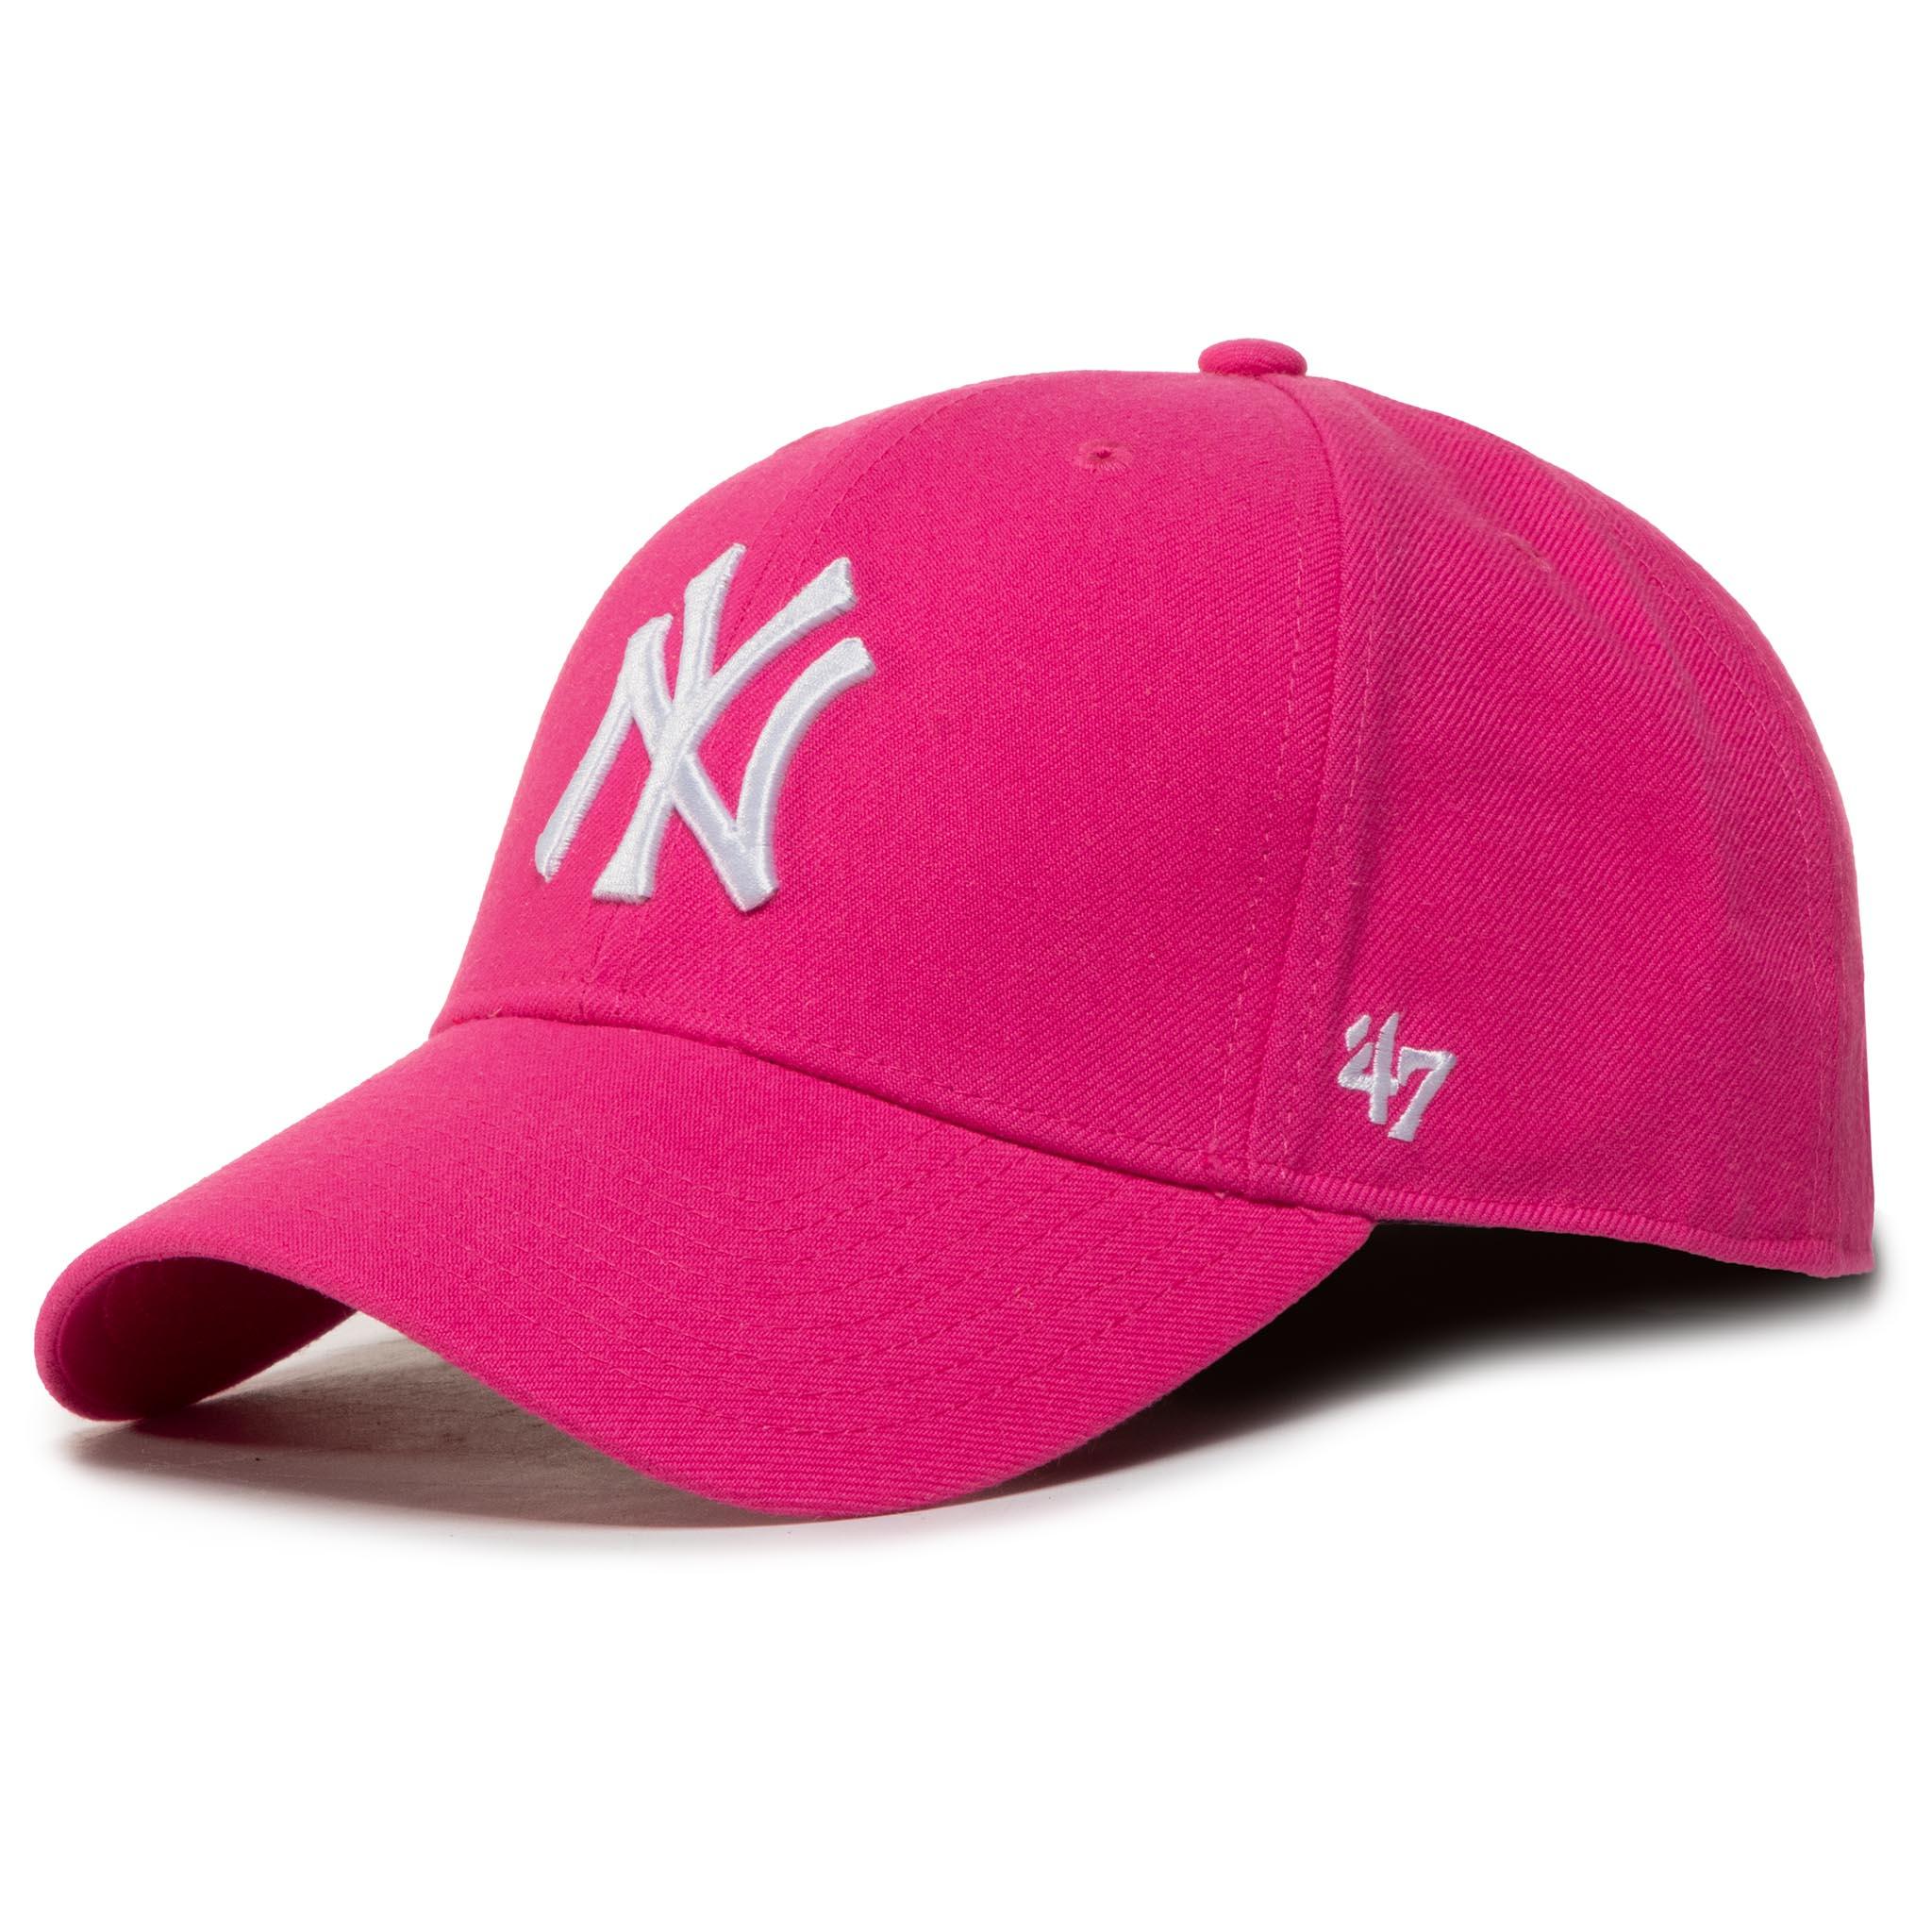 Image of Cap 47 BRAND - Mlb New York Yankees '47 Mvp Snapback B-MVPSP17WBP-MA Magenta